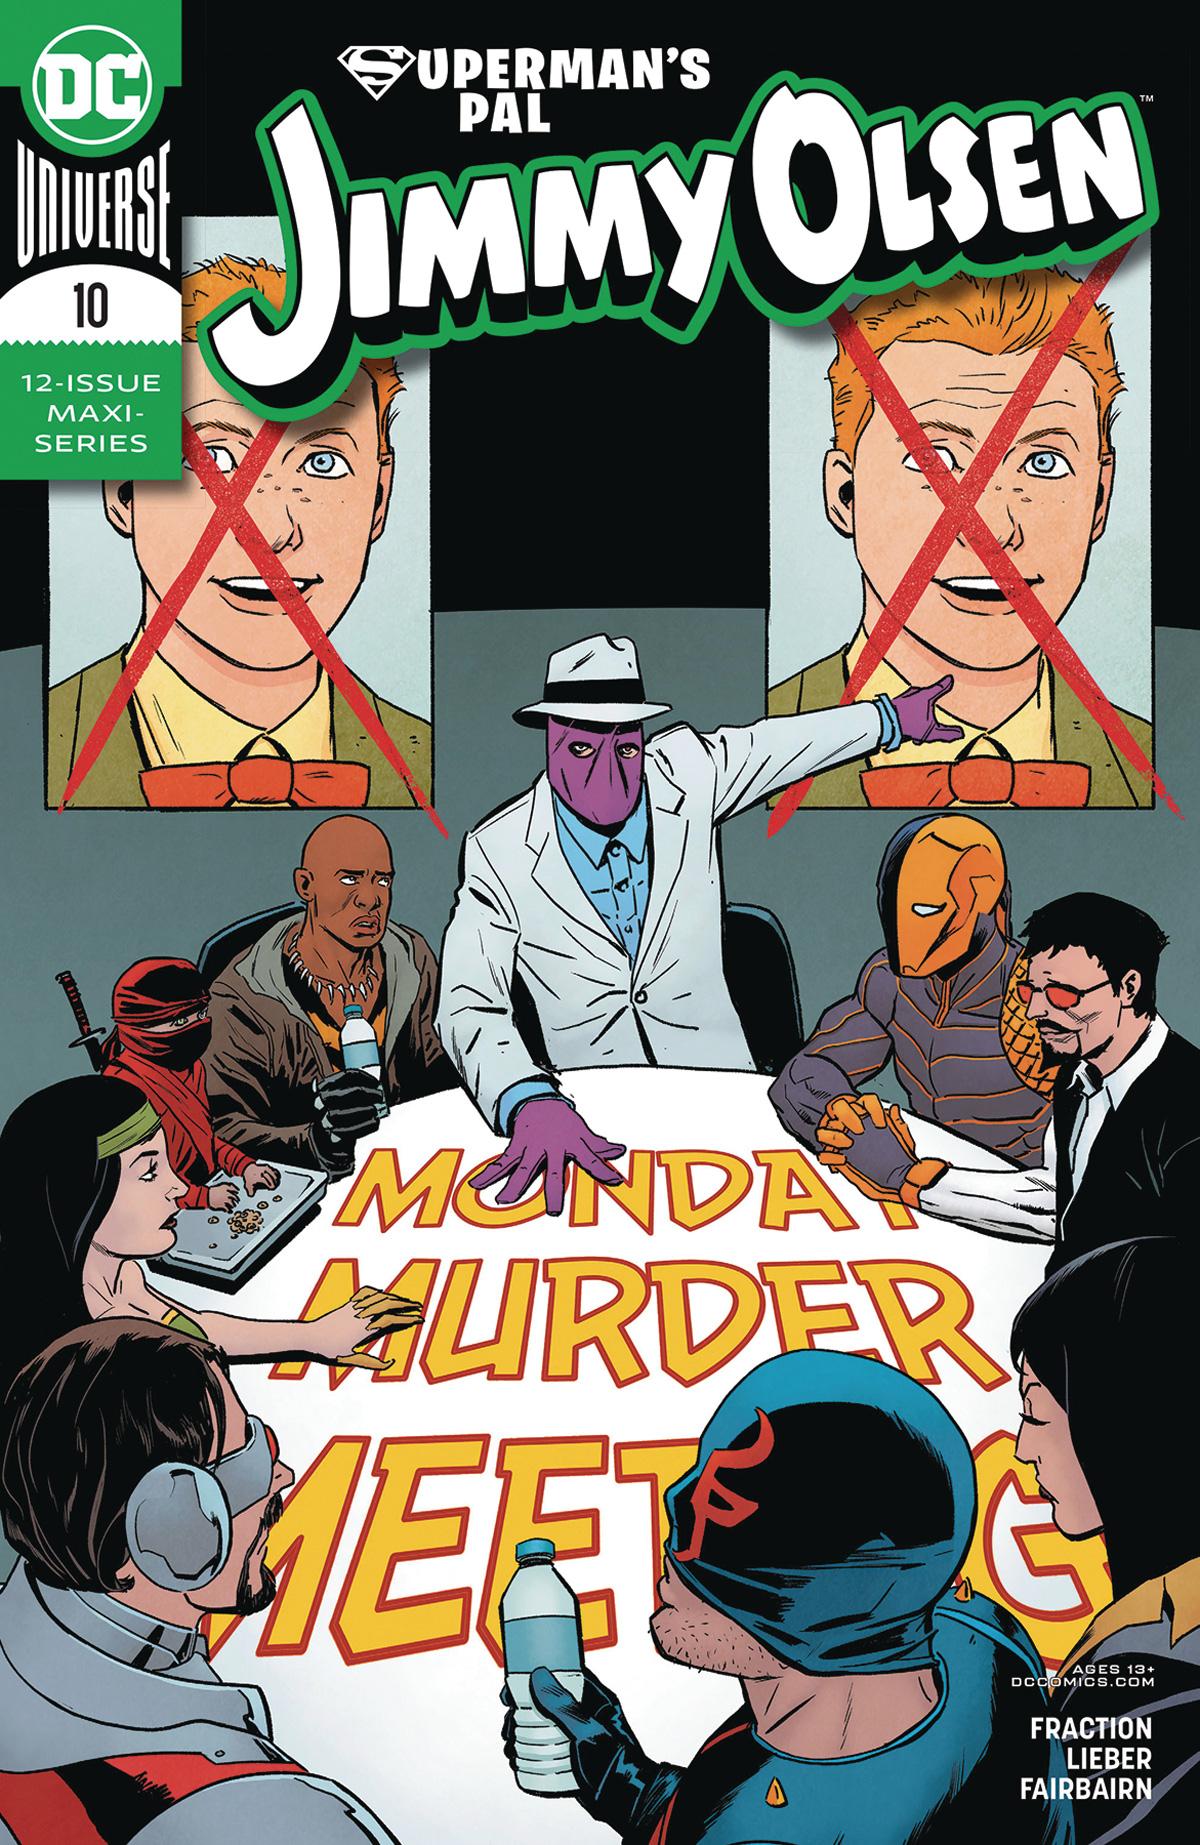 Superman's Pal, Jimmy Olsen #10 (2020)